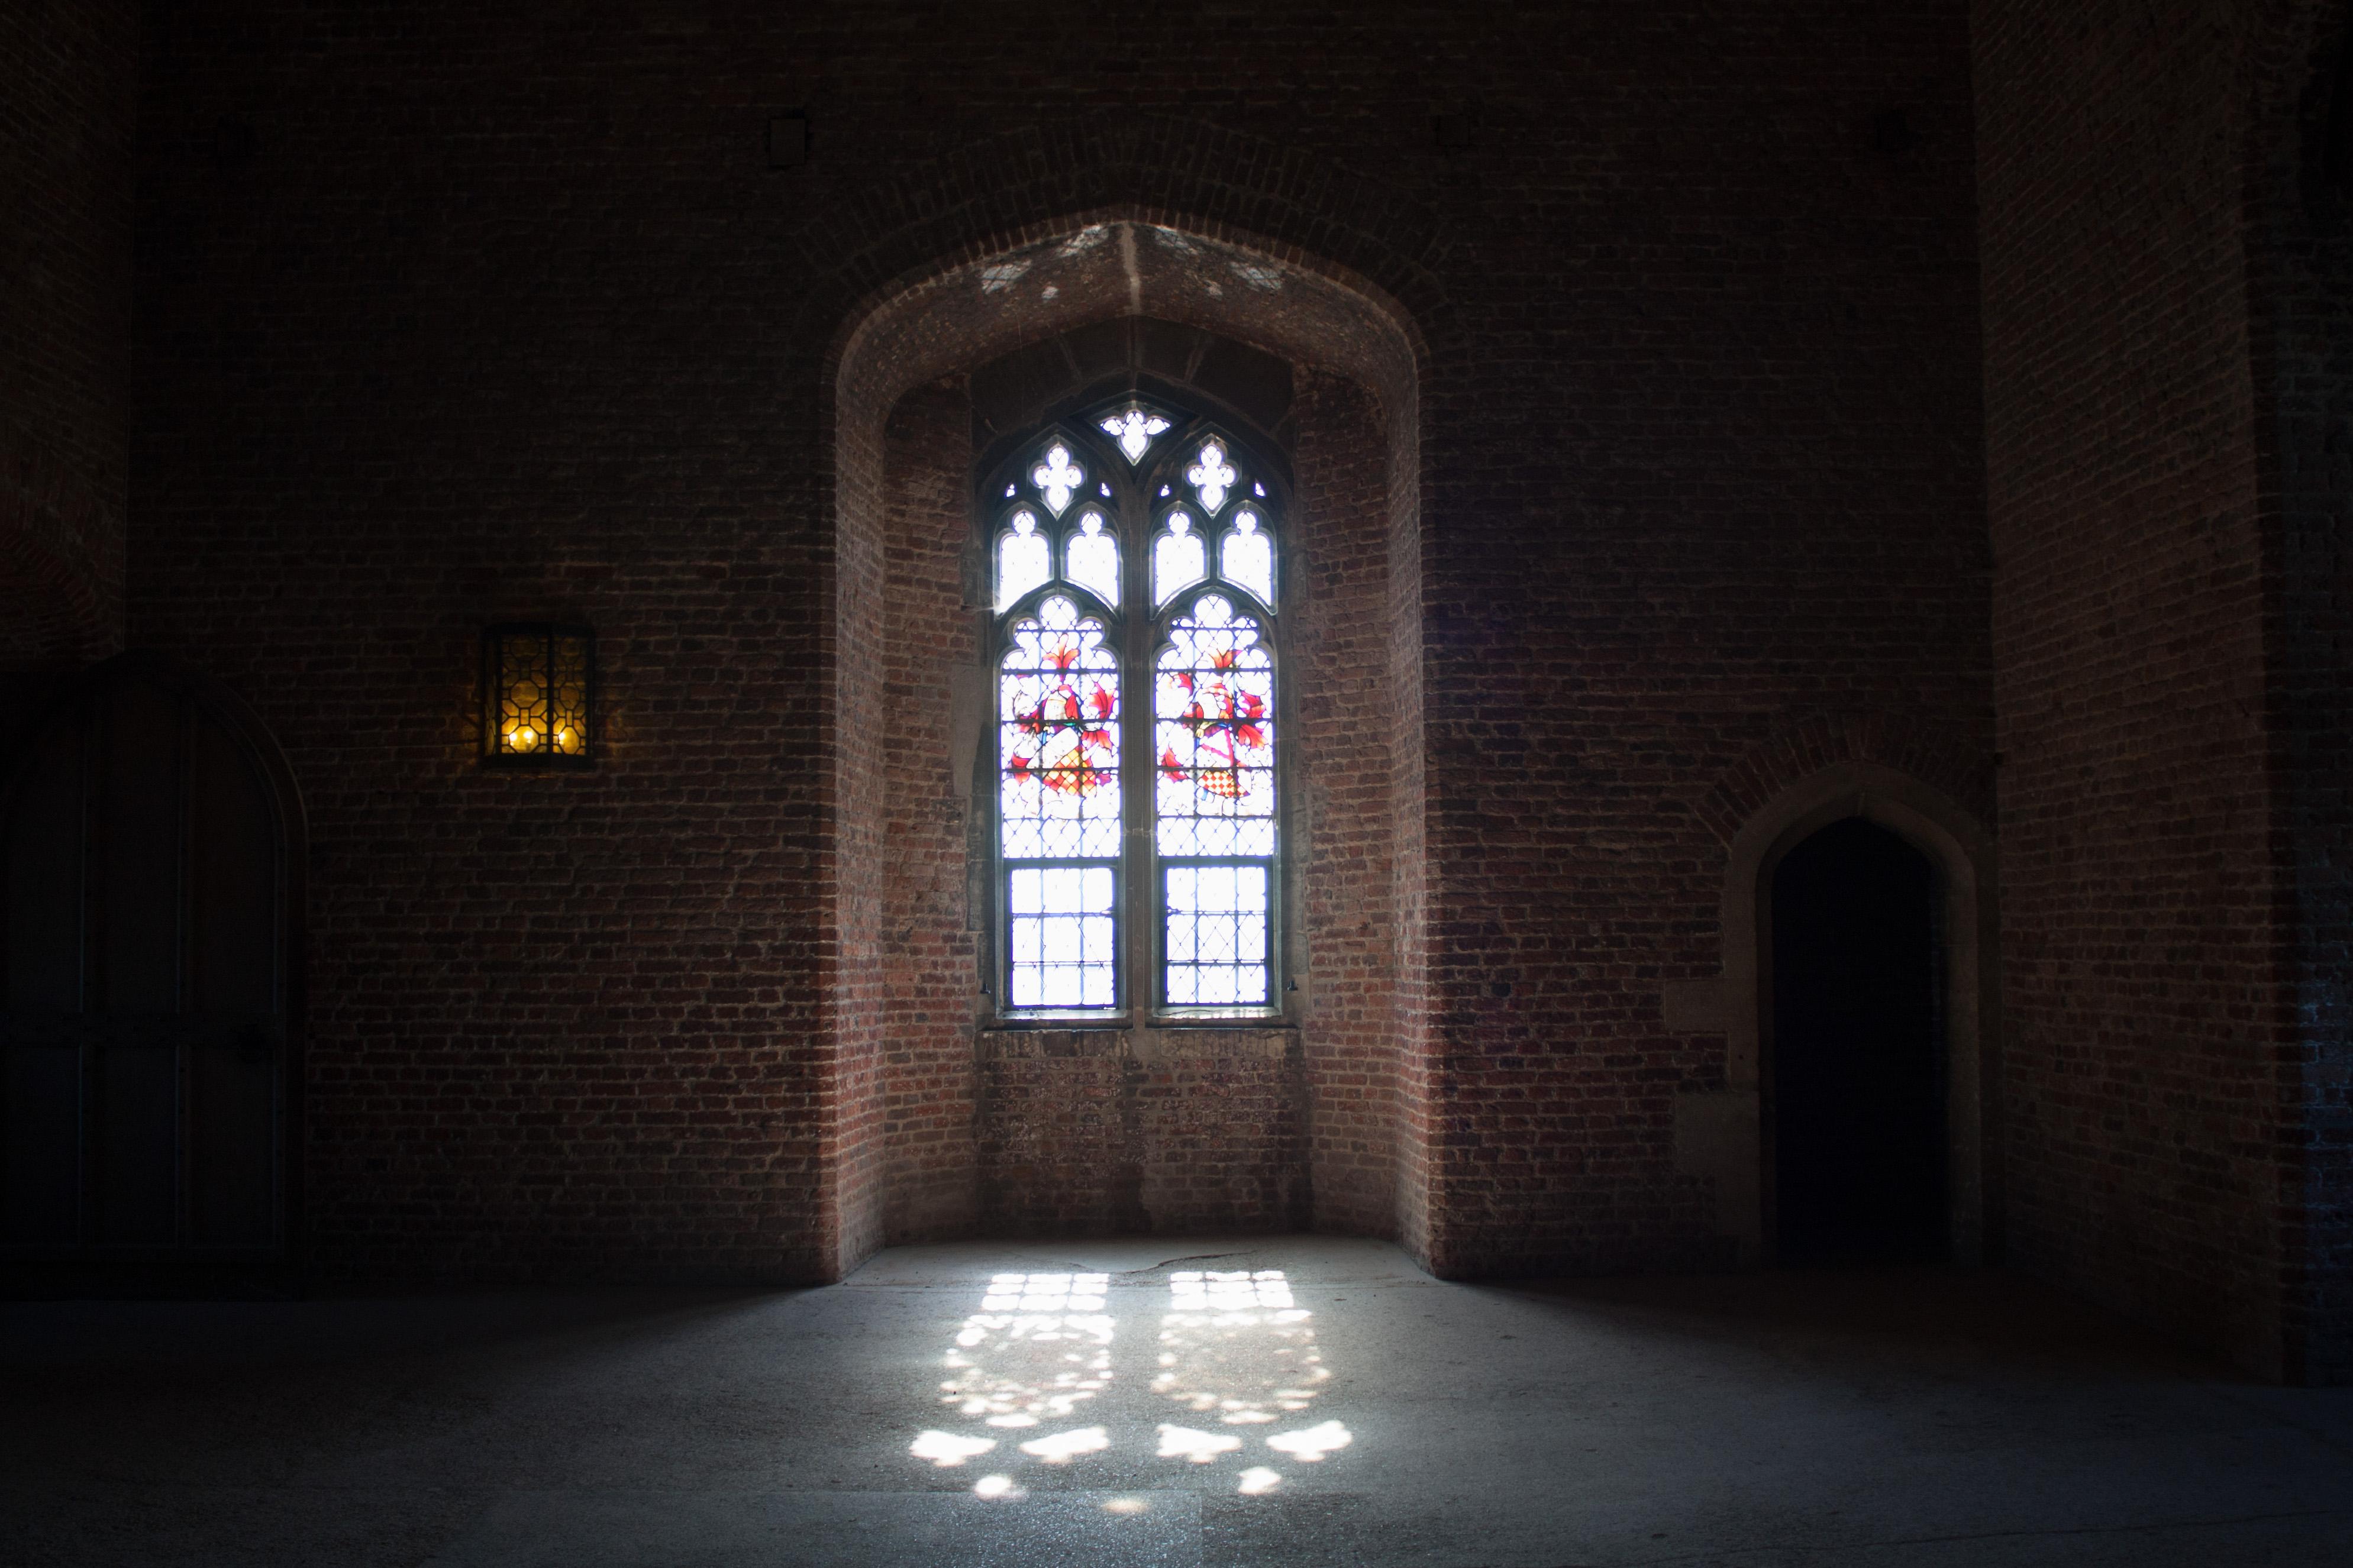 file:tattershall castle interior window - wikimedia commons